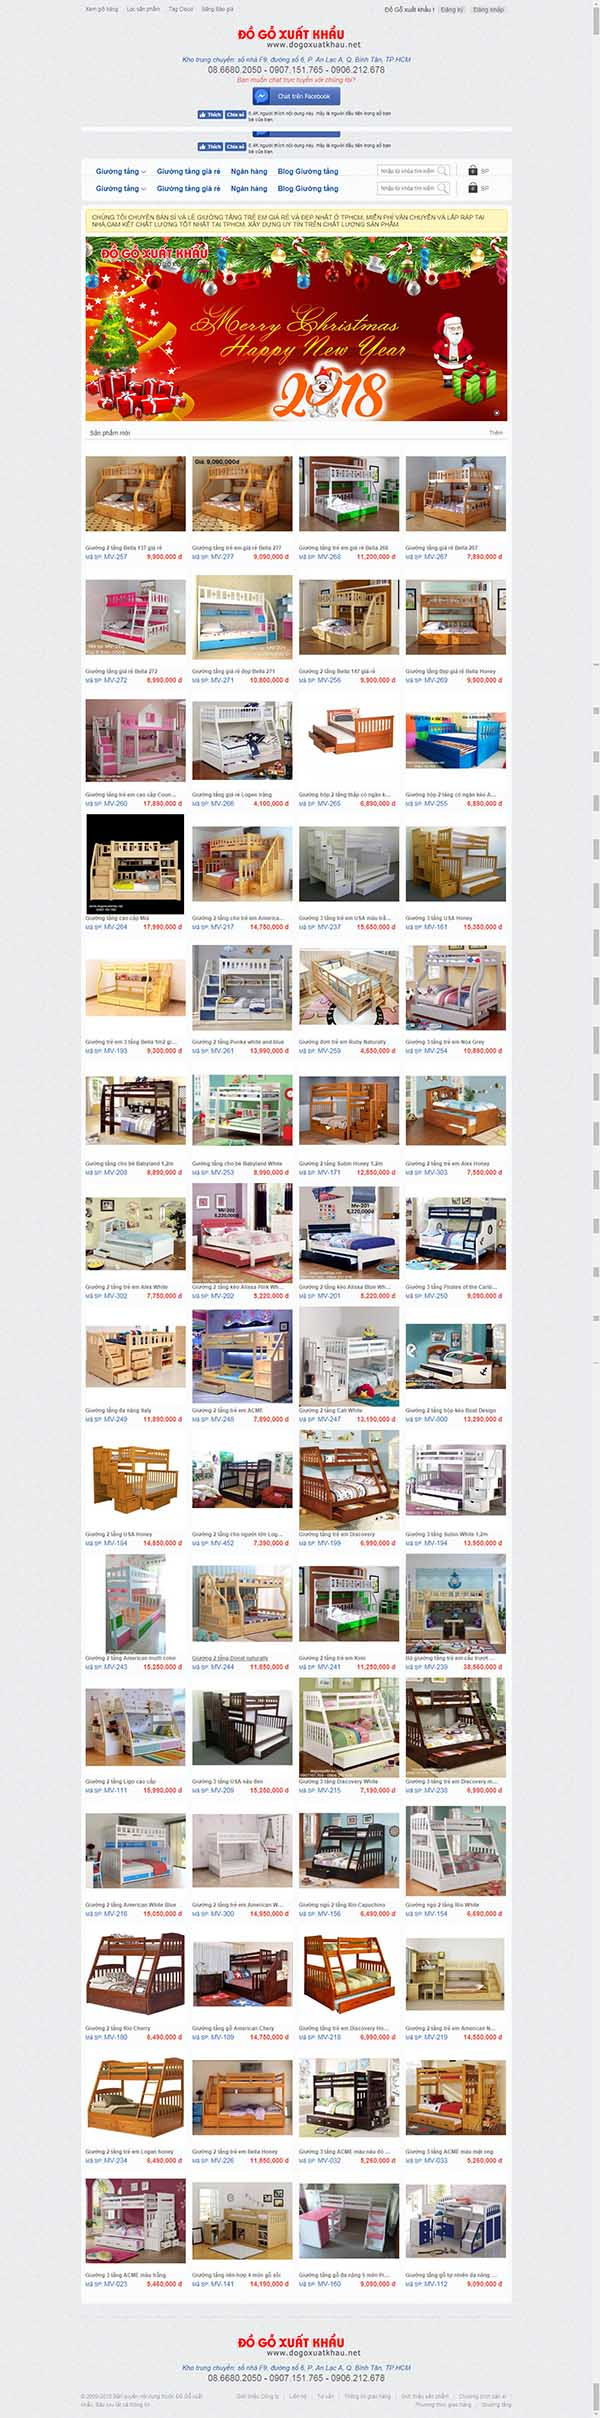 Thiết kế Mẫu website đồ gỗ 01